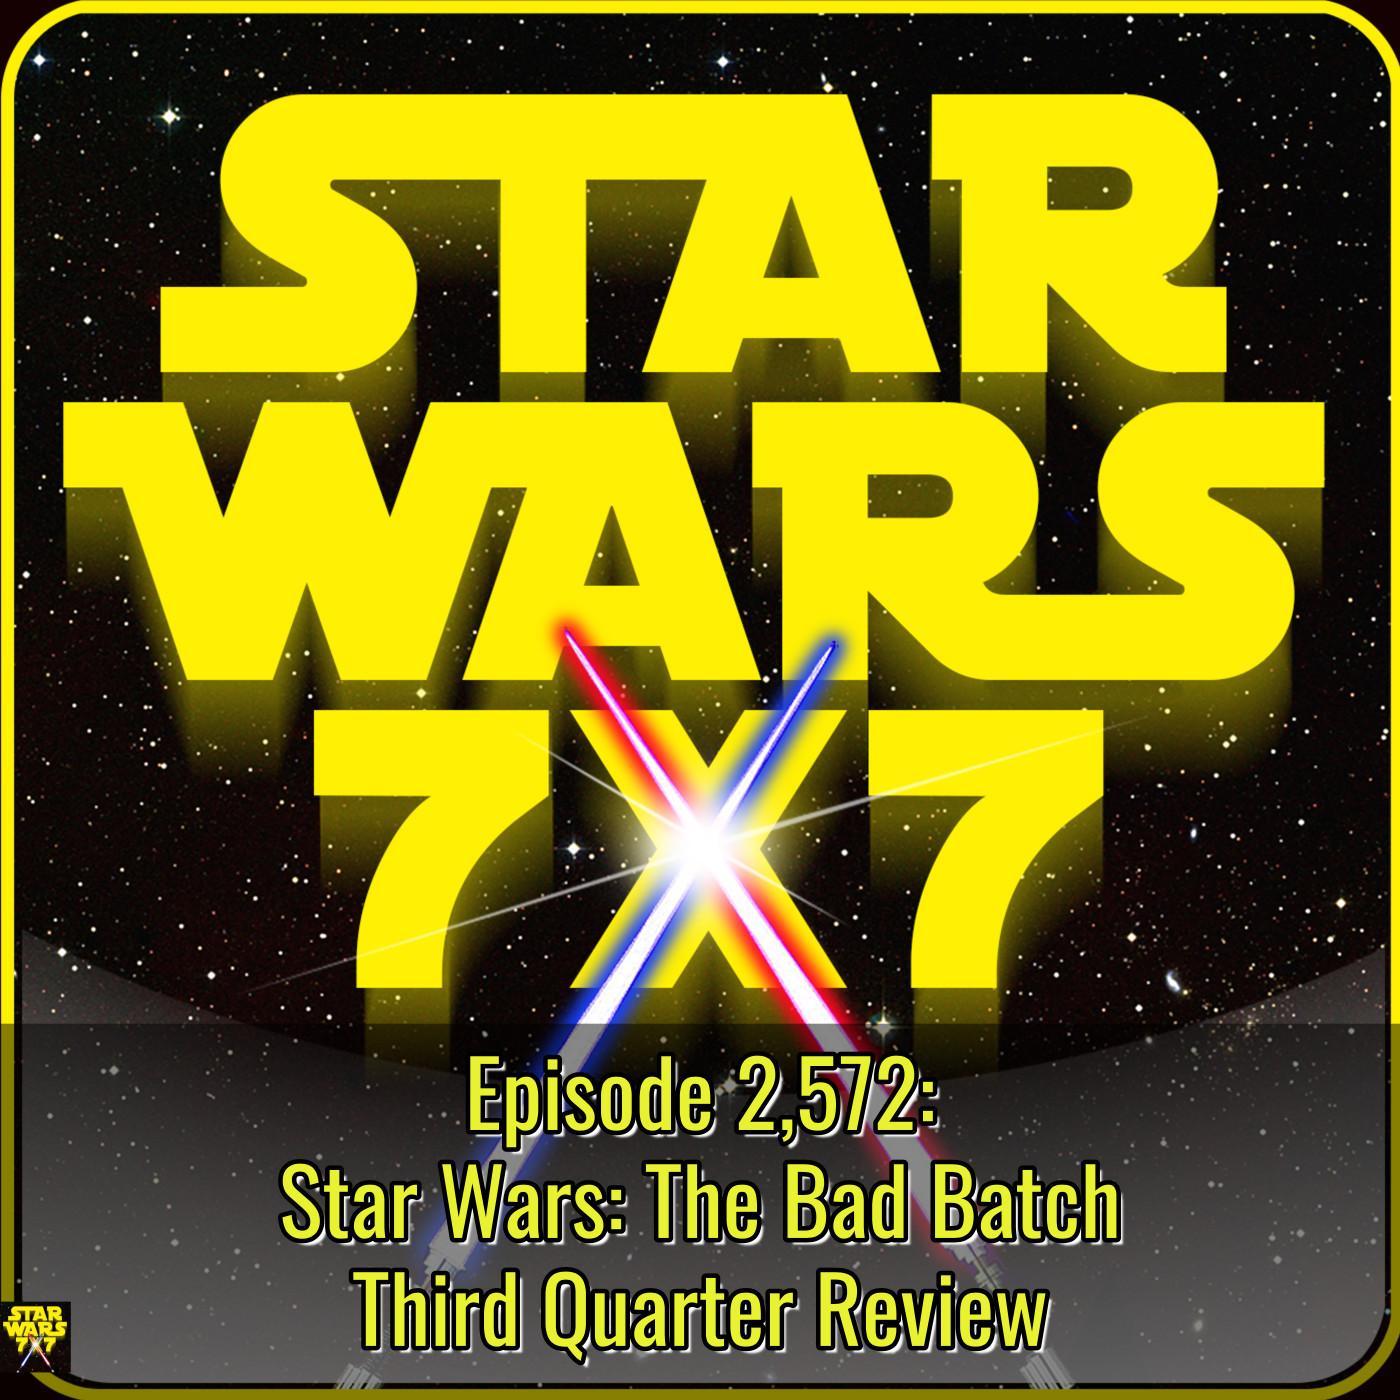 2,572. Star Wars: The Bad Batch Third Quarter Review